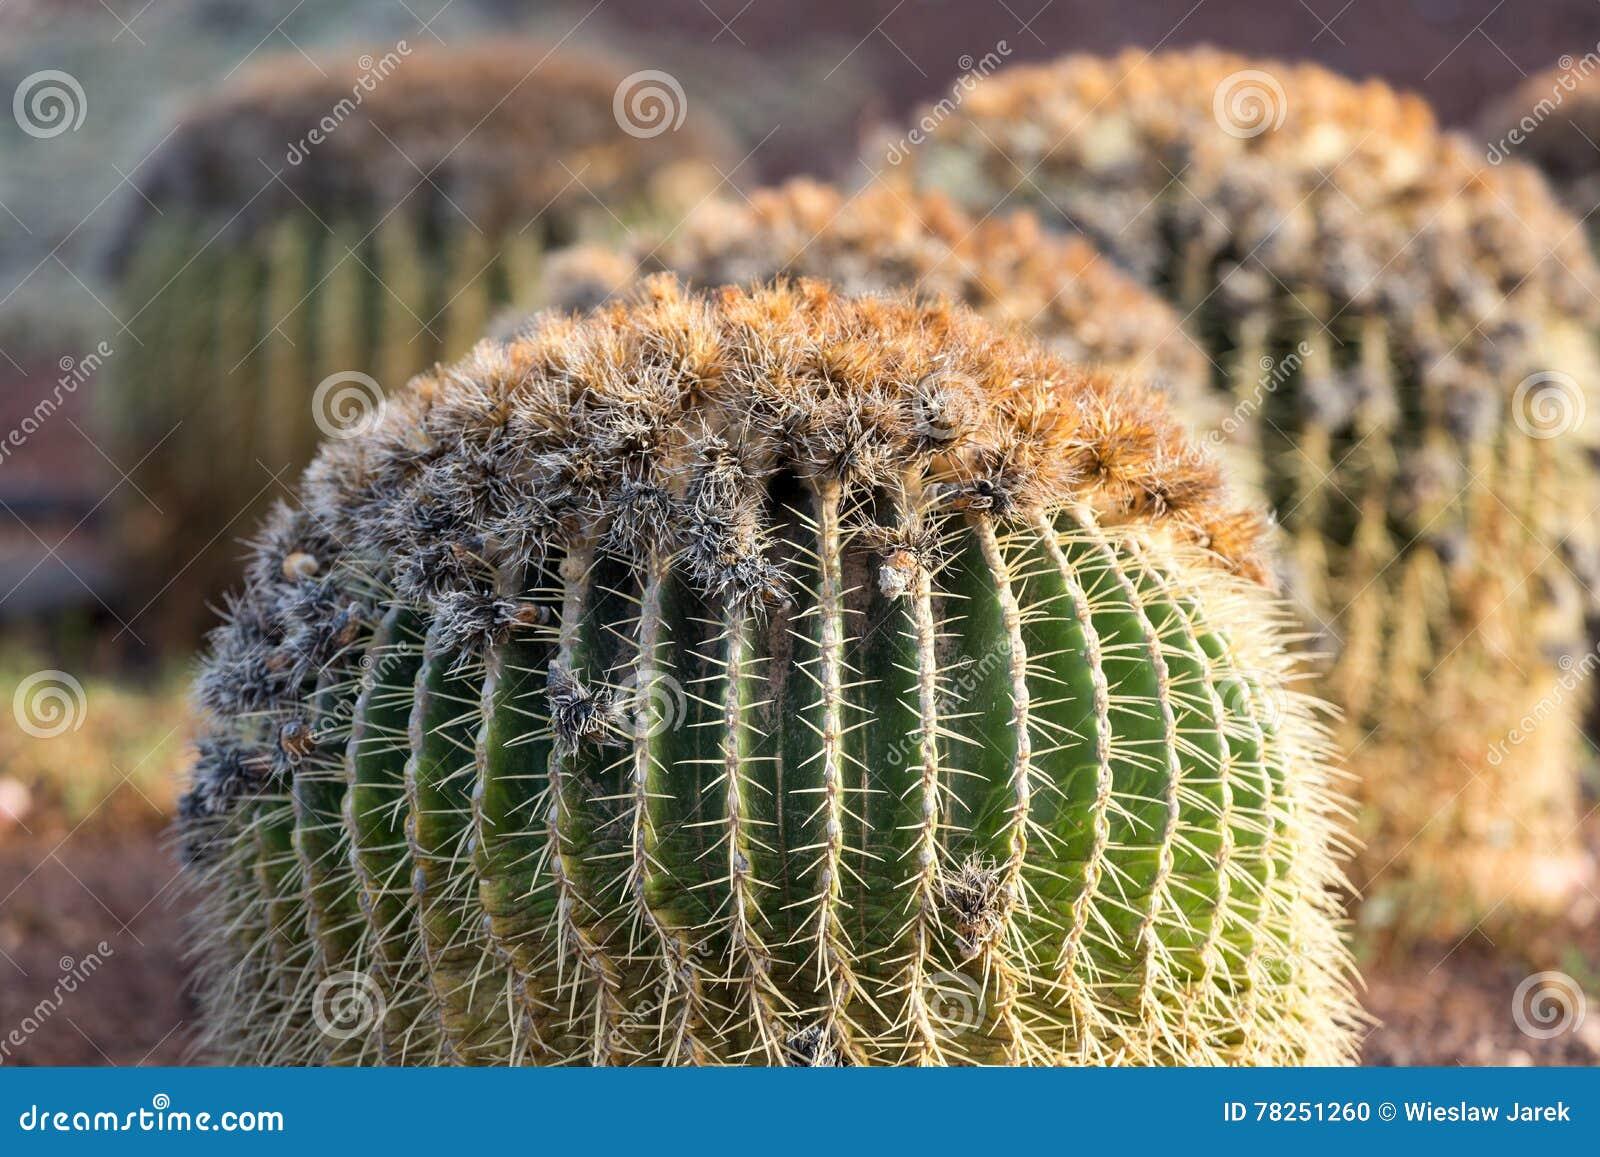 Grusonii Echinocactus, γενικά γνωστό ως χρυσός κάκτος βαρελιών,